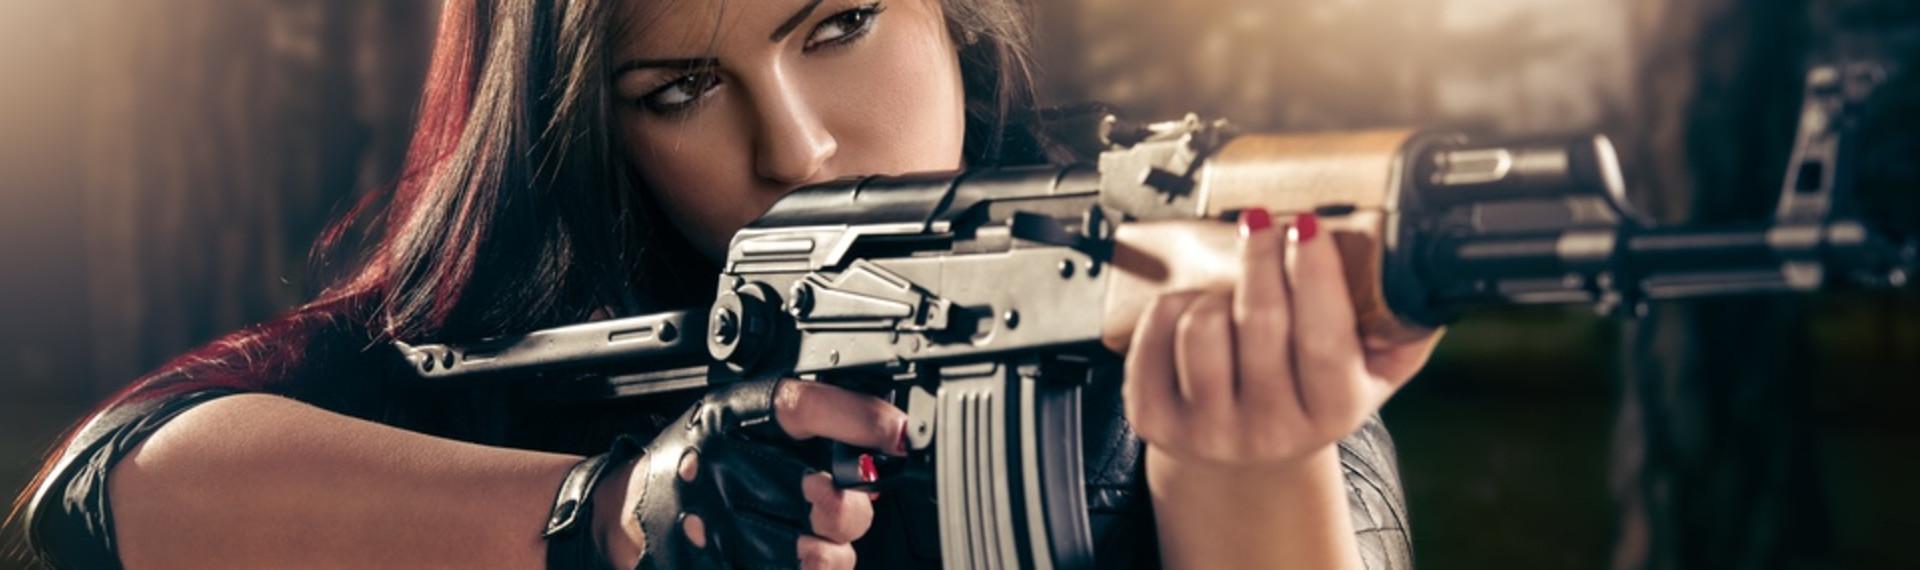 Krakow AK-47 Machine Gun Fest image